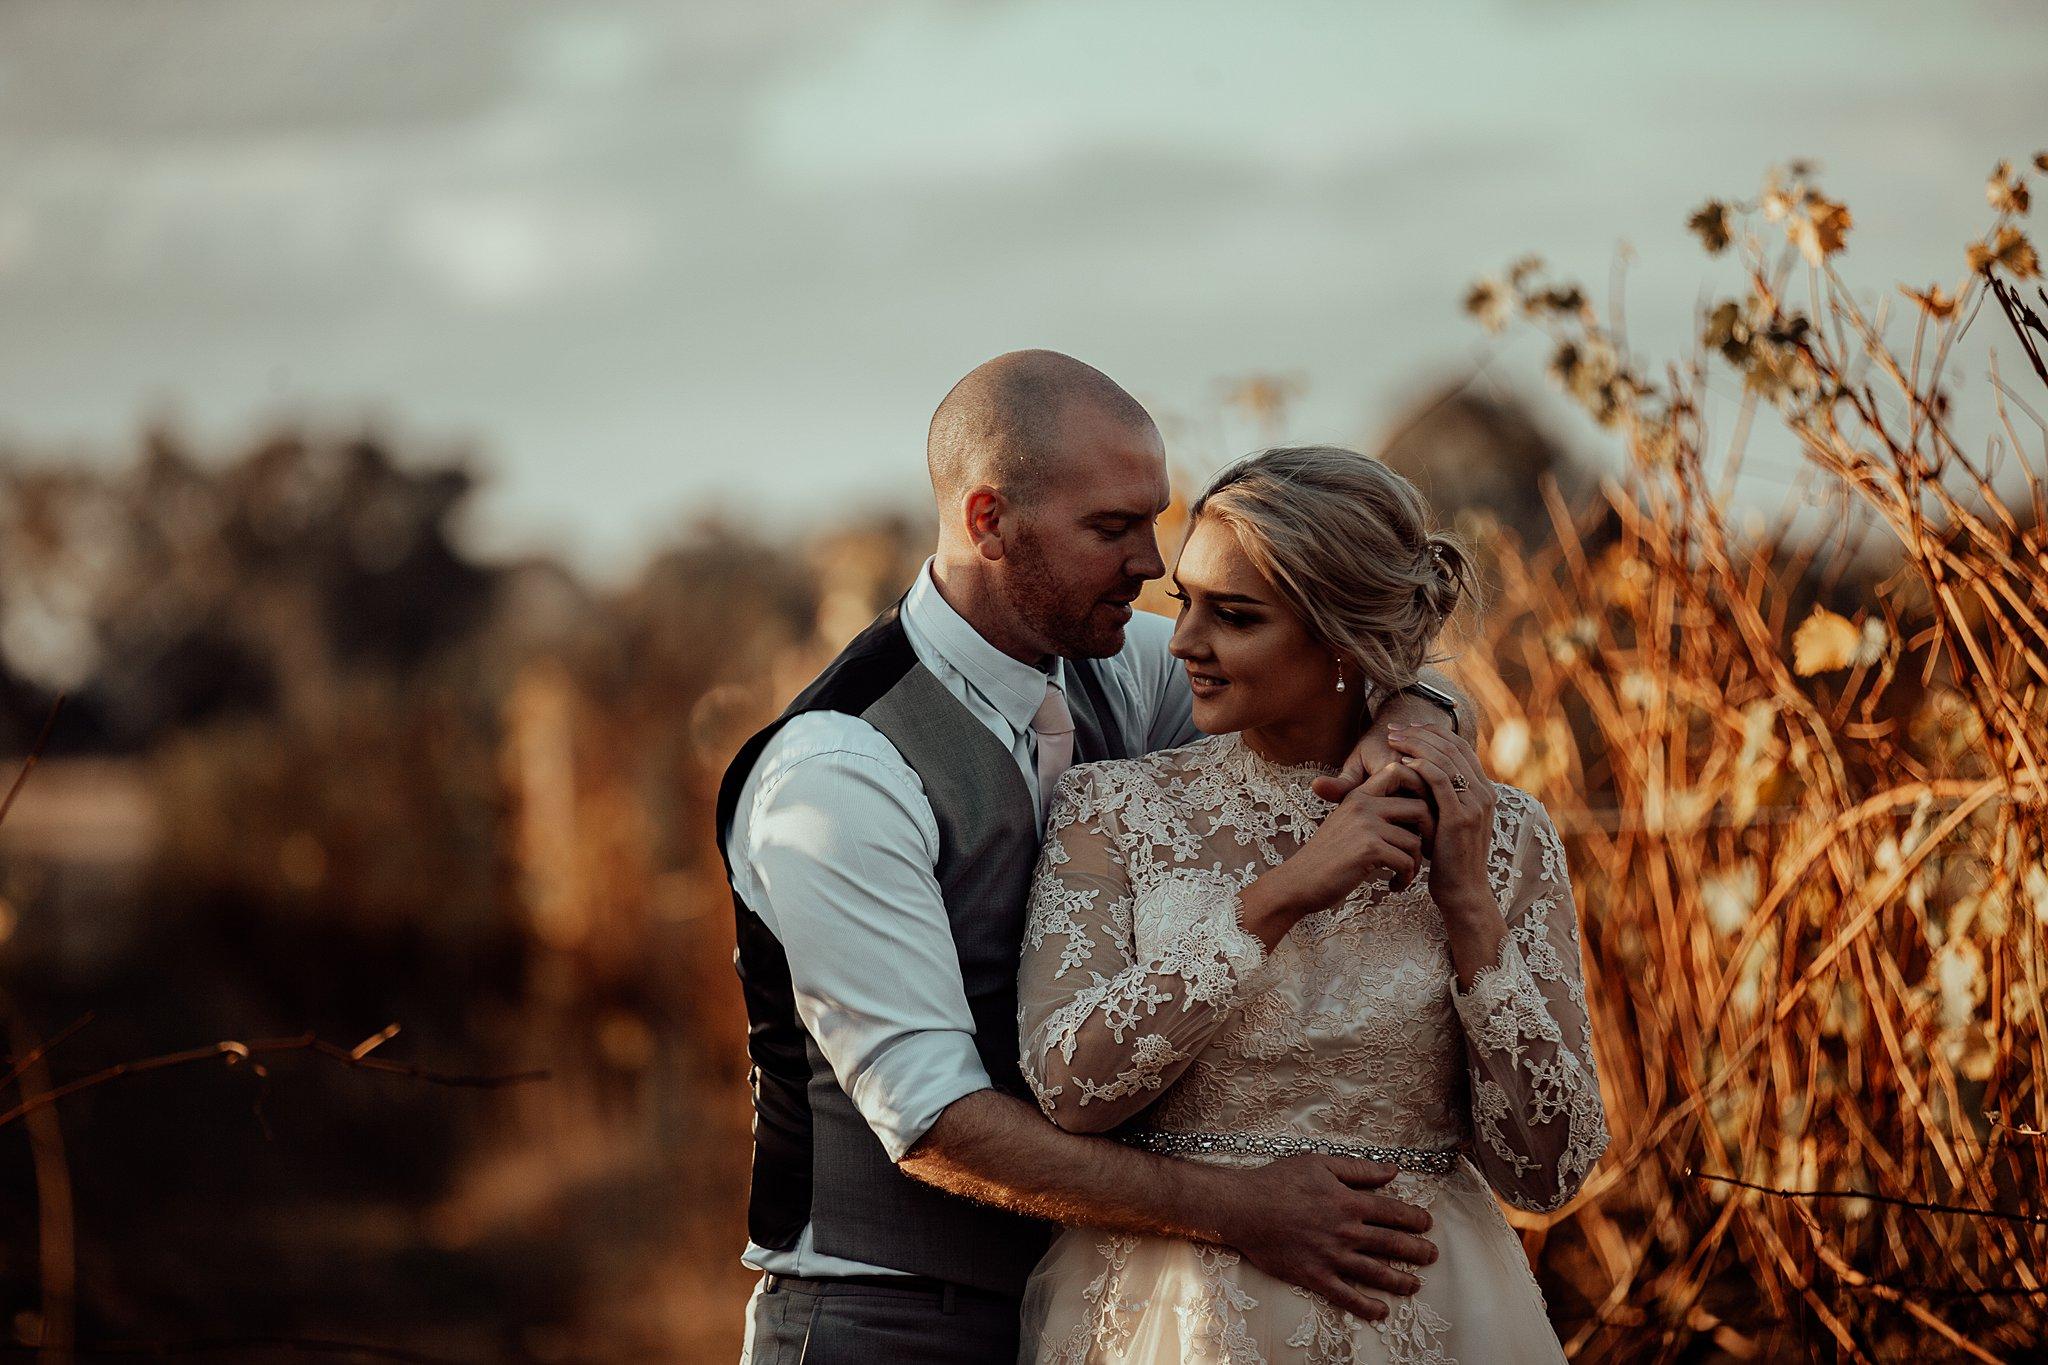 mickalathomas_puremacphotography_weddingphotographer_couplephotographer_Sheppartonphotographer_3469.jpg